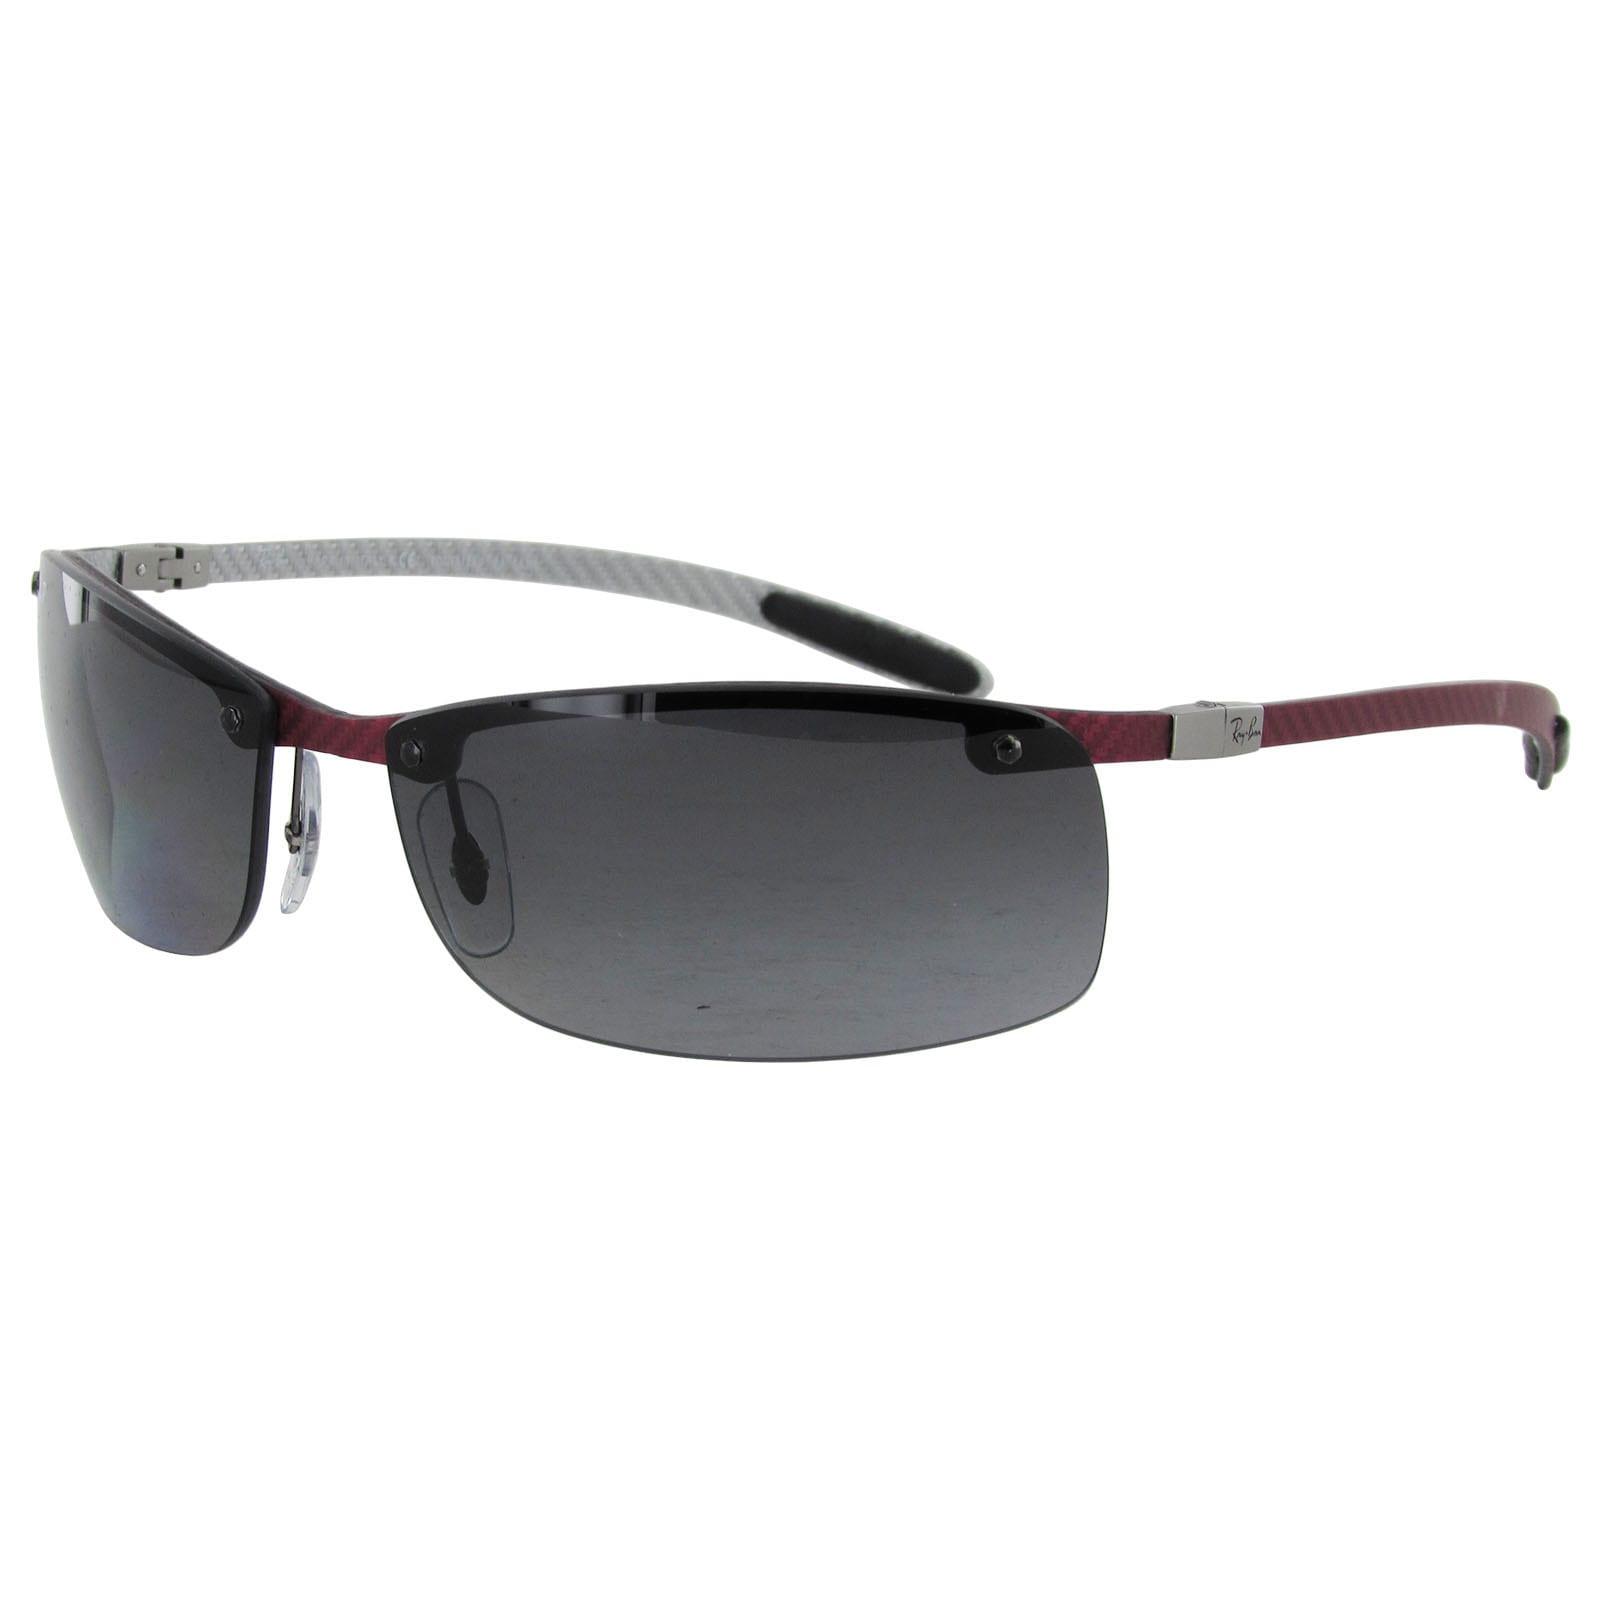 ee2da8f565a ... order shop ray ban tech carbon fibre semi rimless polarized sunglasses  free shipping today overstock 14174294